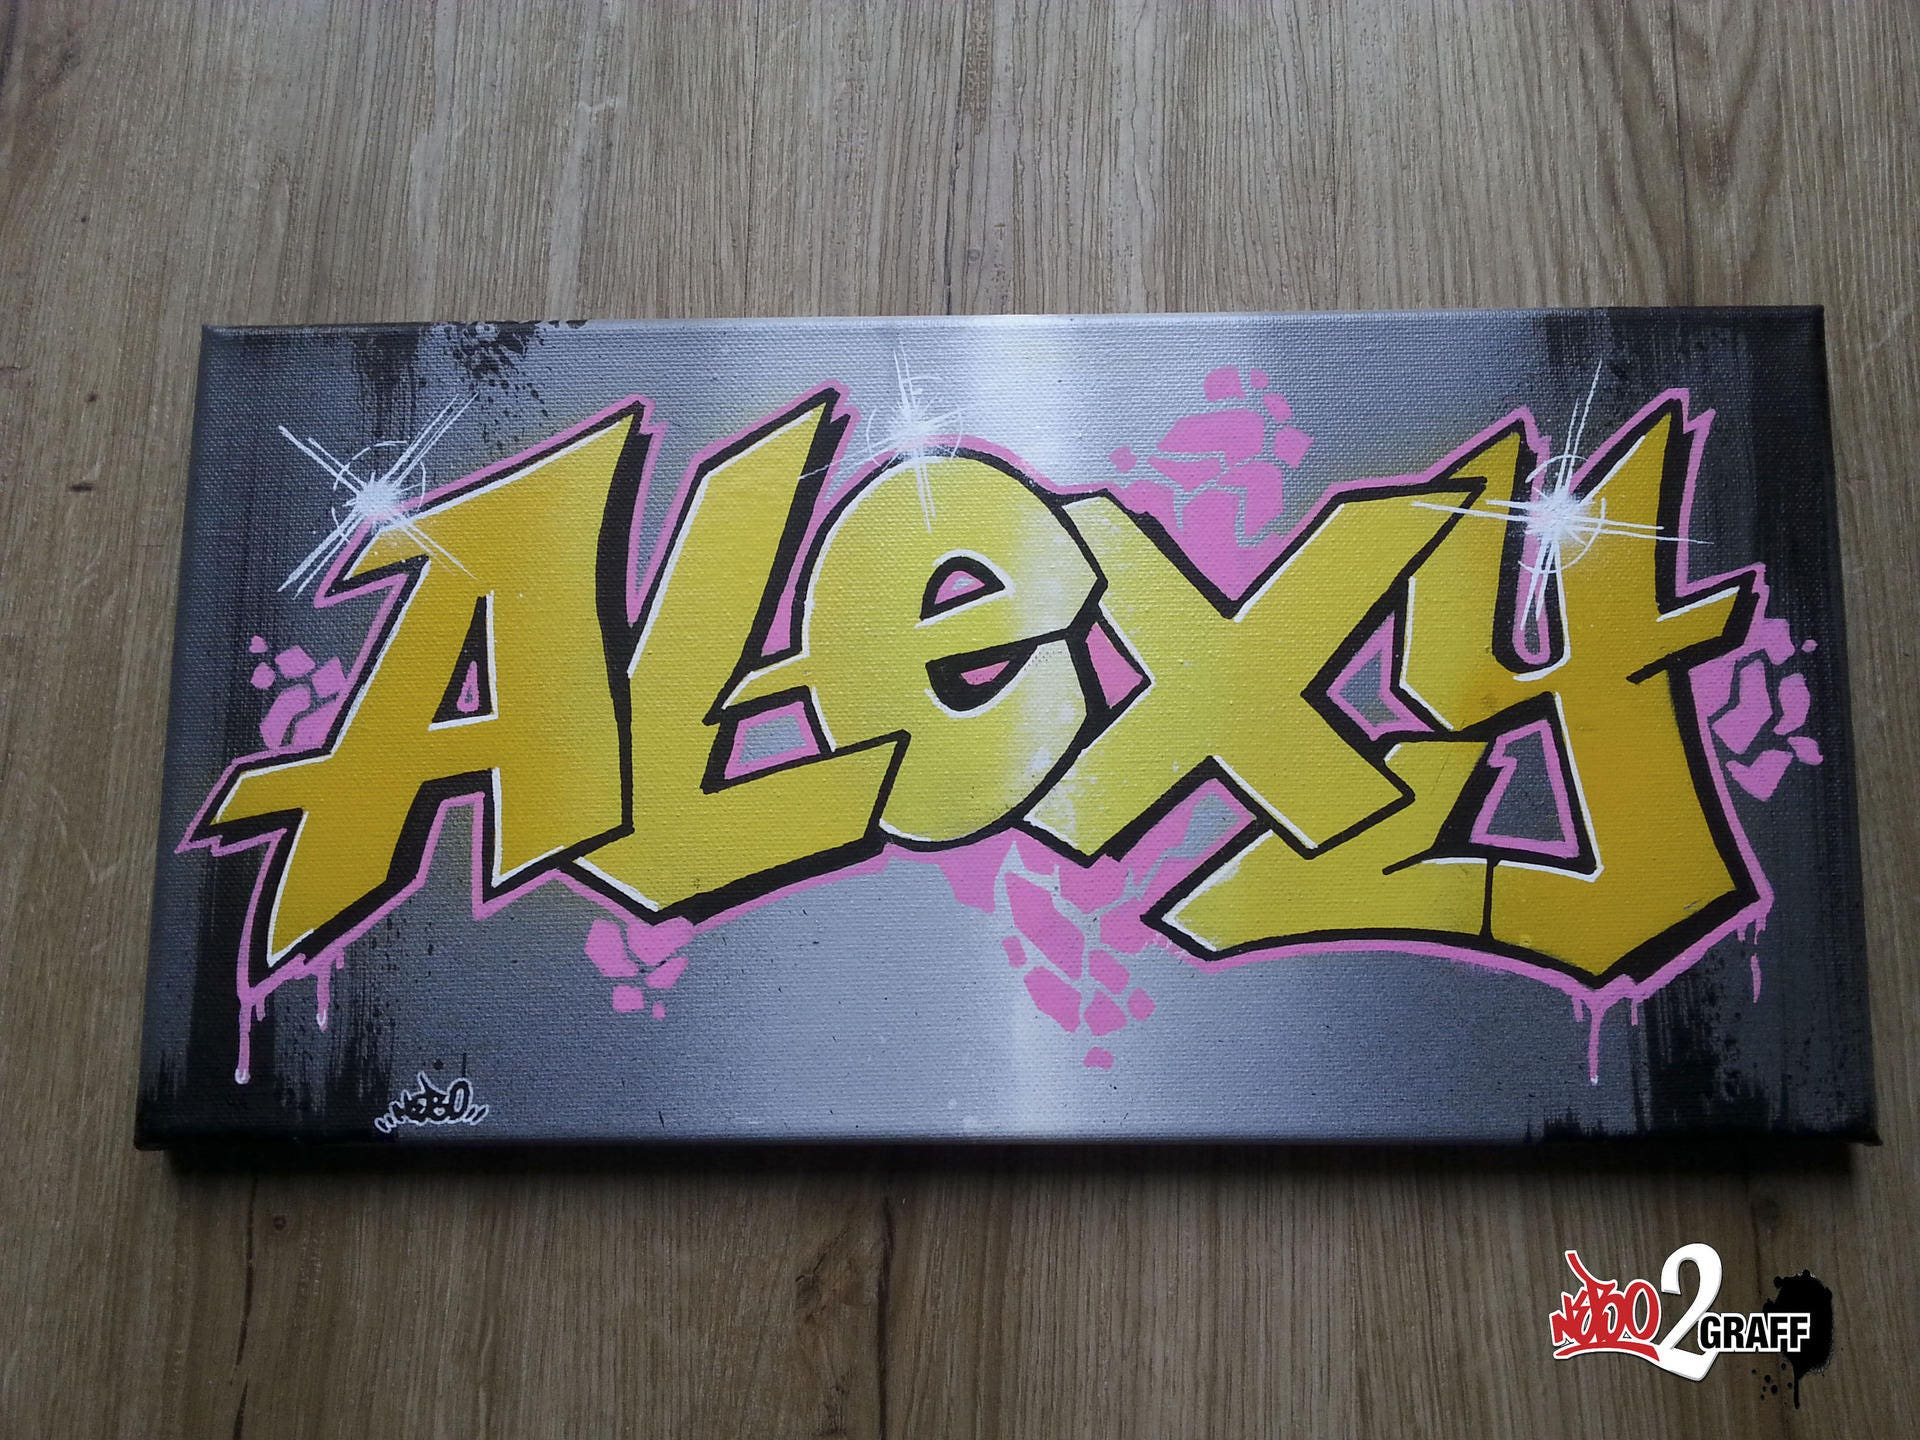 Tableau graffiti pr nom tag personnalis toile id e cadeau - Graffiti prenom gratuit ...